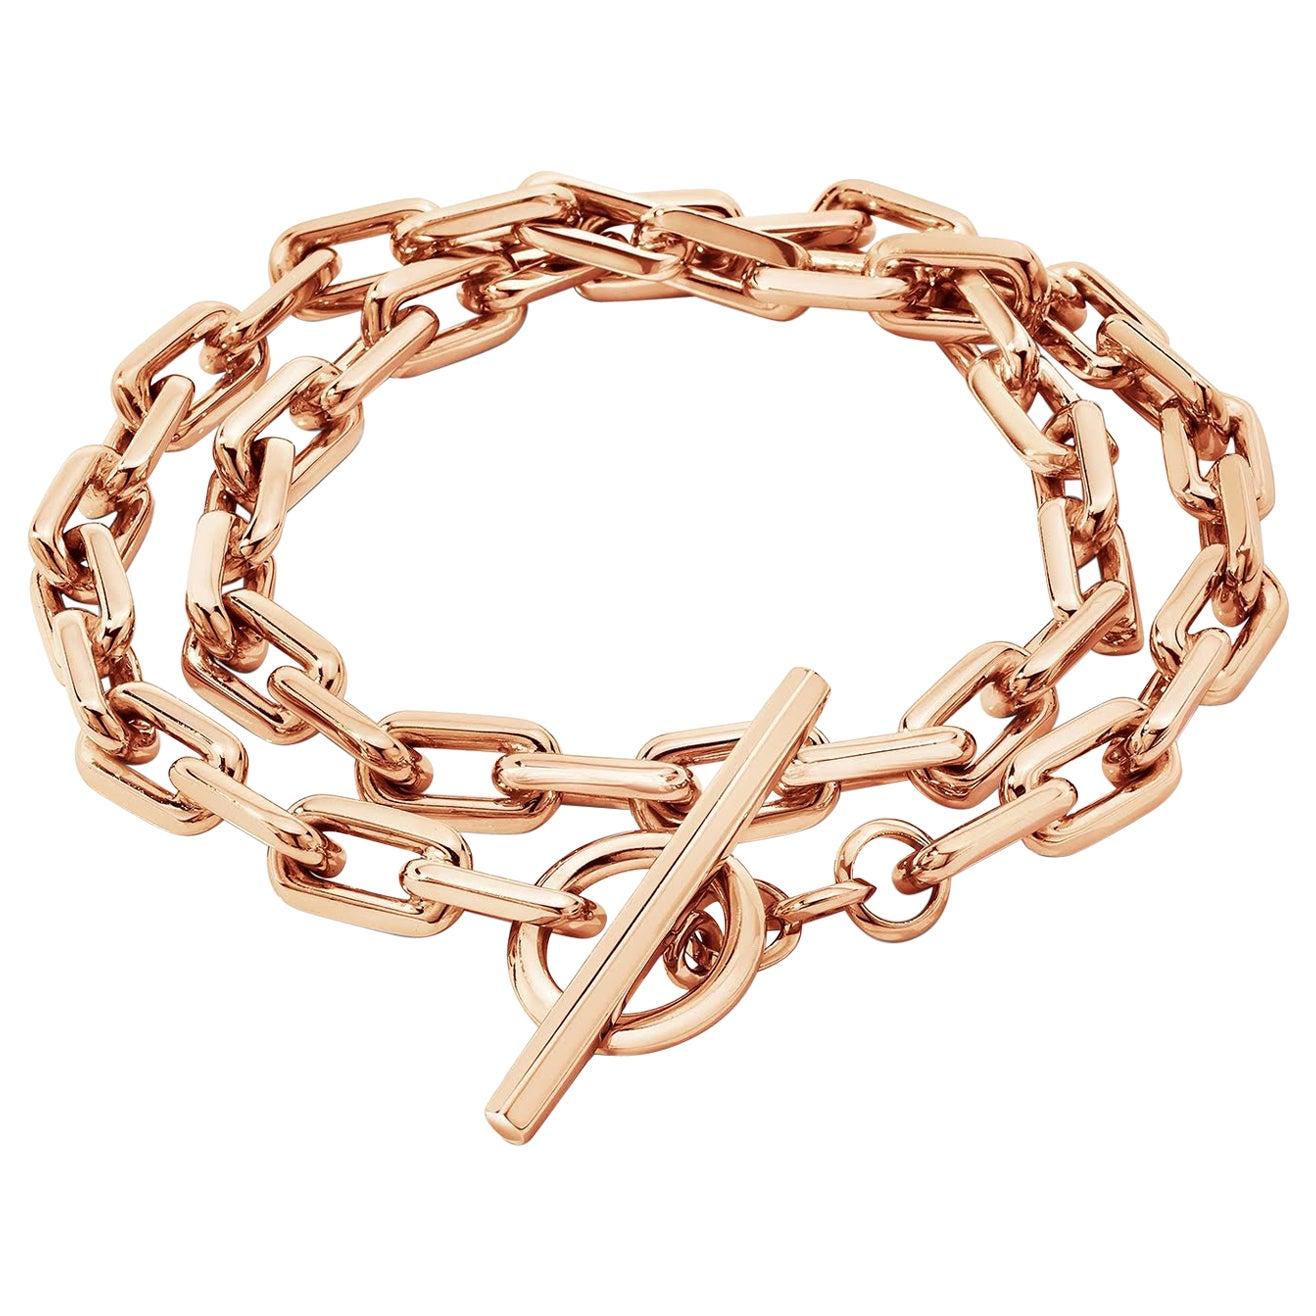 Walters Faith 18 Karat Rose Gold Double Wrap Chain Link Toggle Bracelet